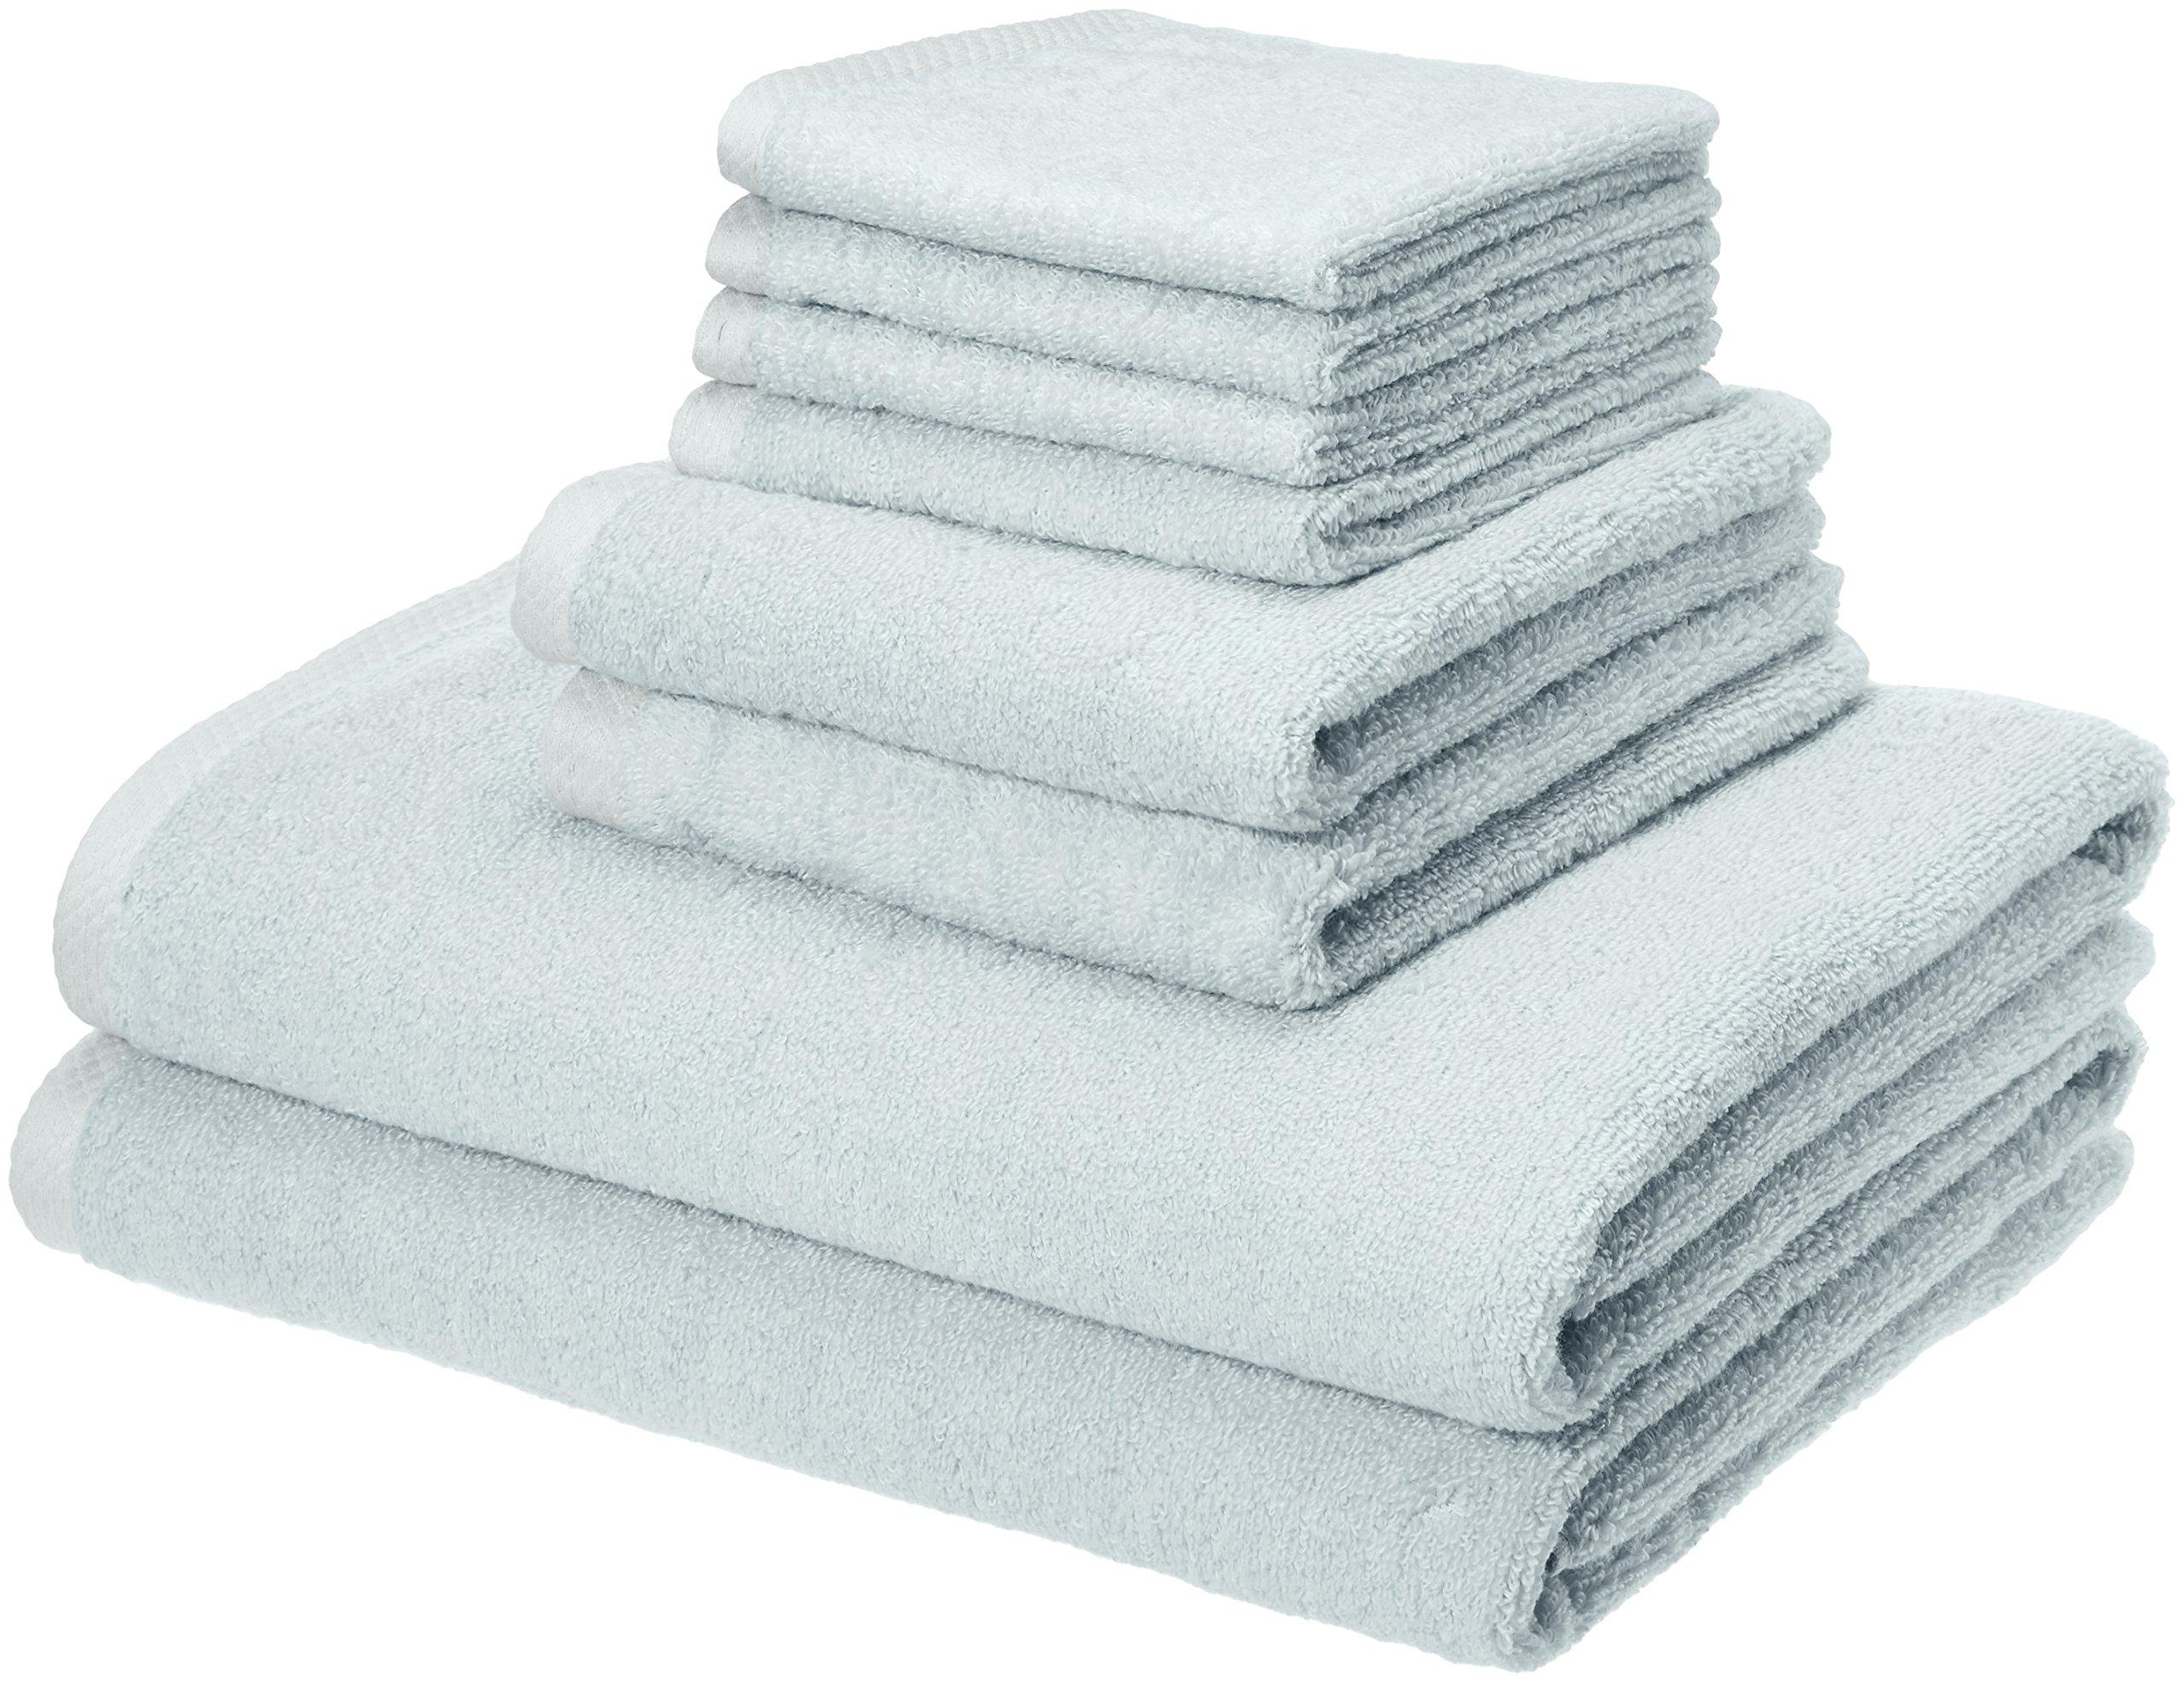 AmazonBasics Quick-Dry, Luxurious, Soft, 100% Cotton Towels, Ice Blue - 8-Piece Set